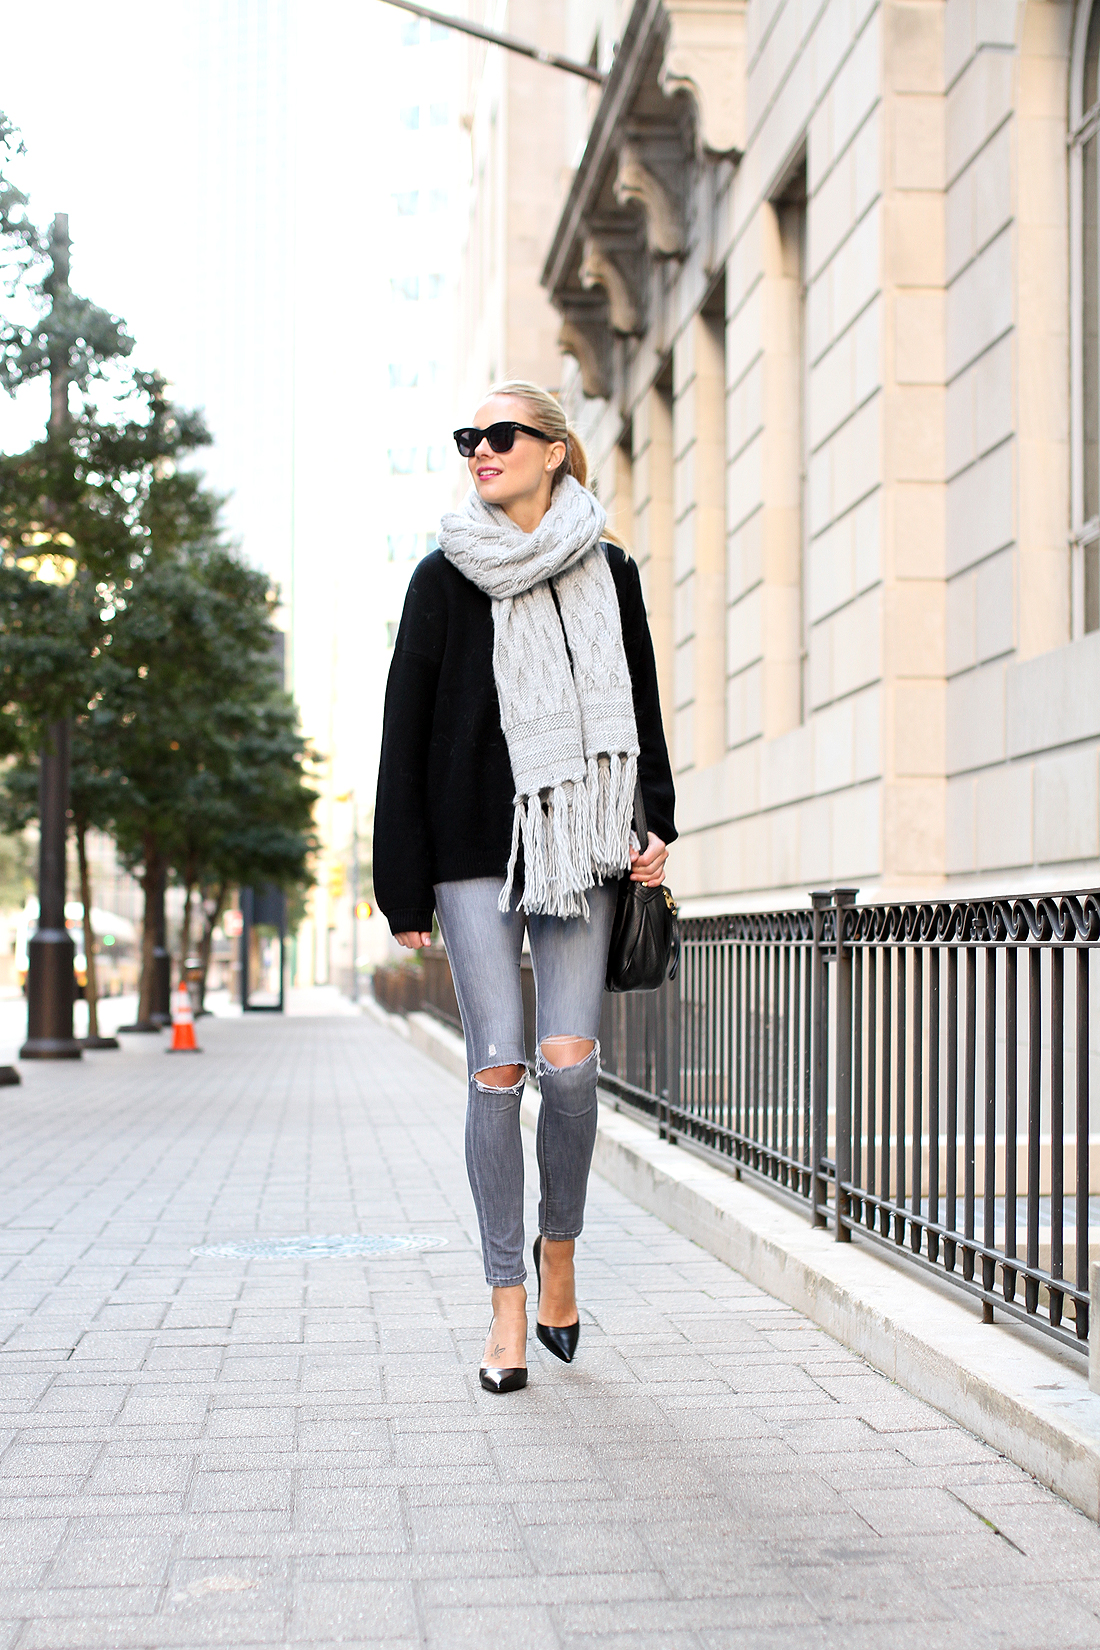 fashion-jackson-celine-sunglasses-banana-republic-grey-fringe-scarf-black-oversized-sweater-grey-ripped-skinny-jeans-black-pumps